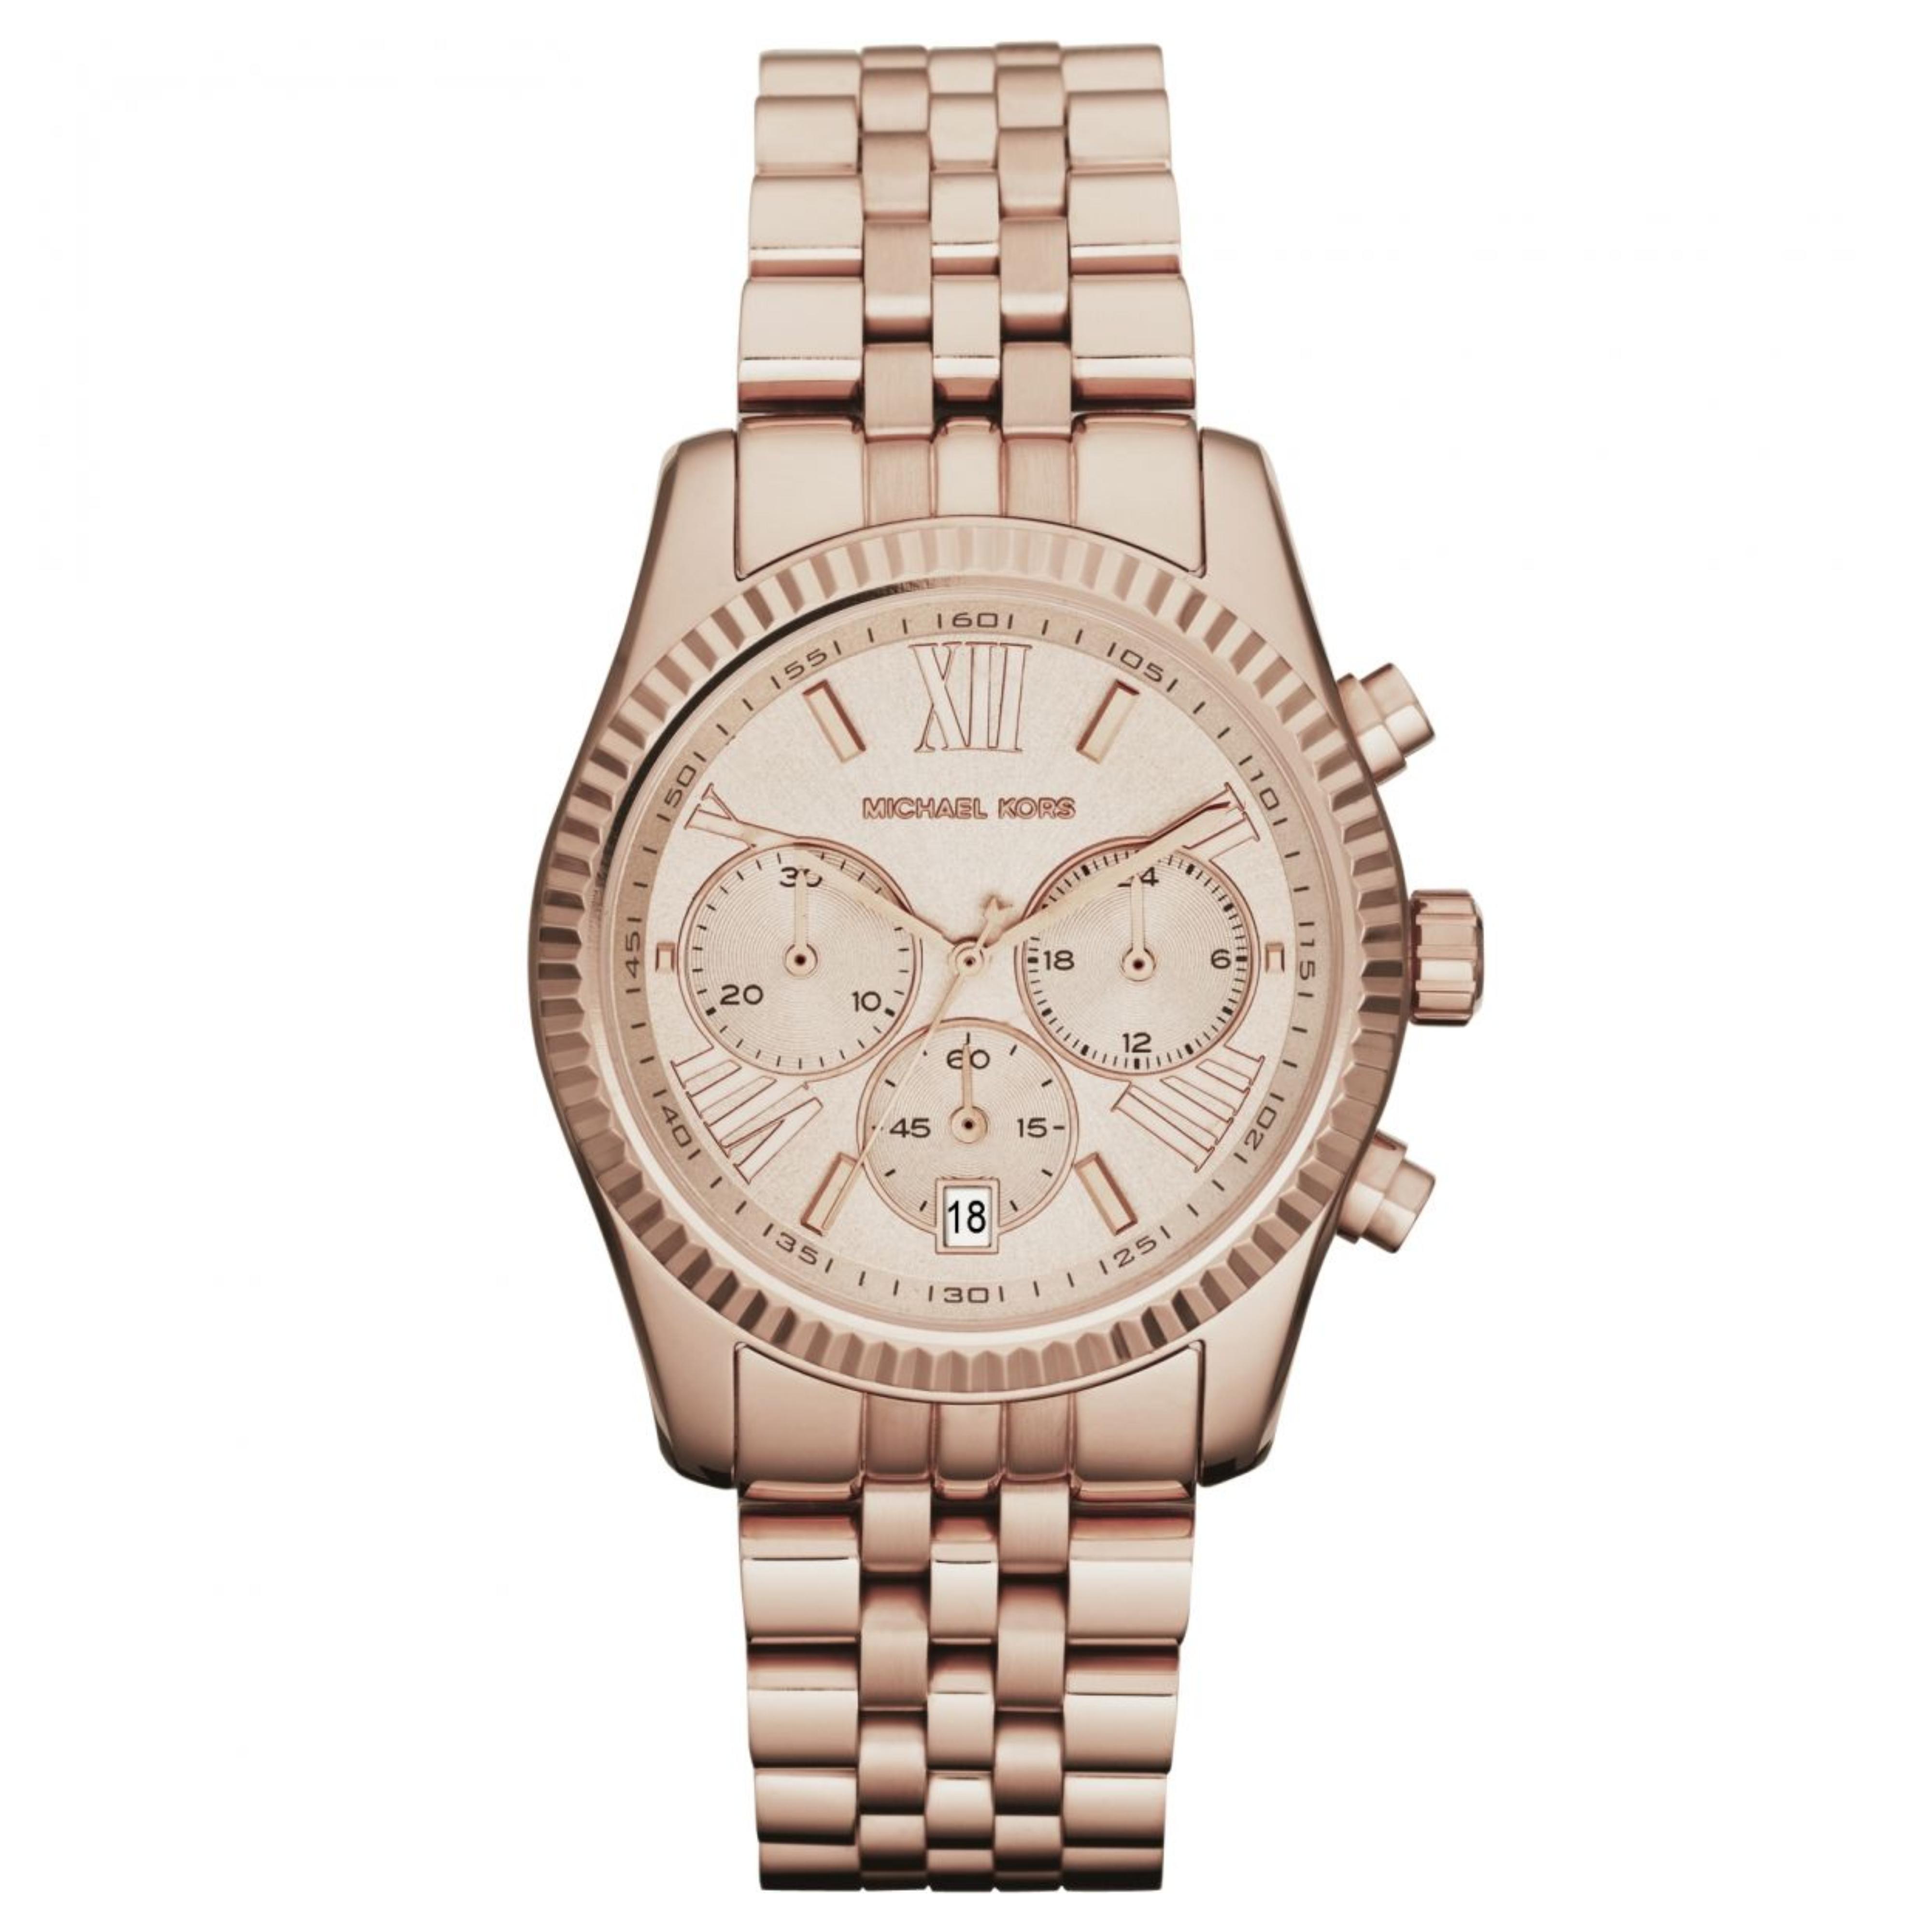 Michael Kors Lexington Ladies Watch|Chrono Dial|Rose Gold Designer Strap|MK5569